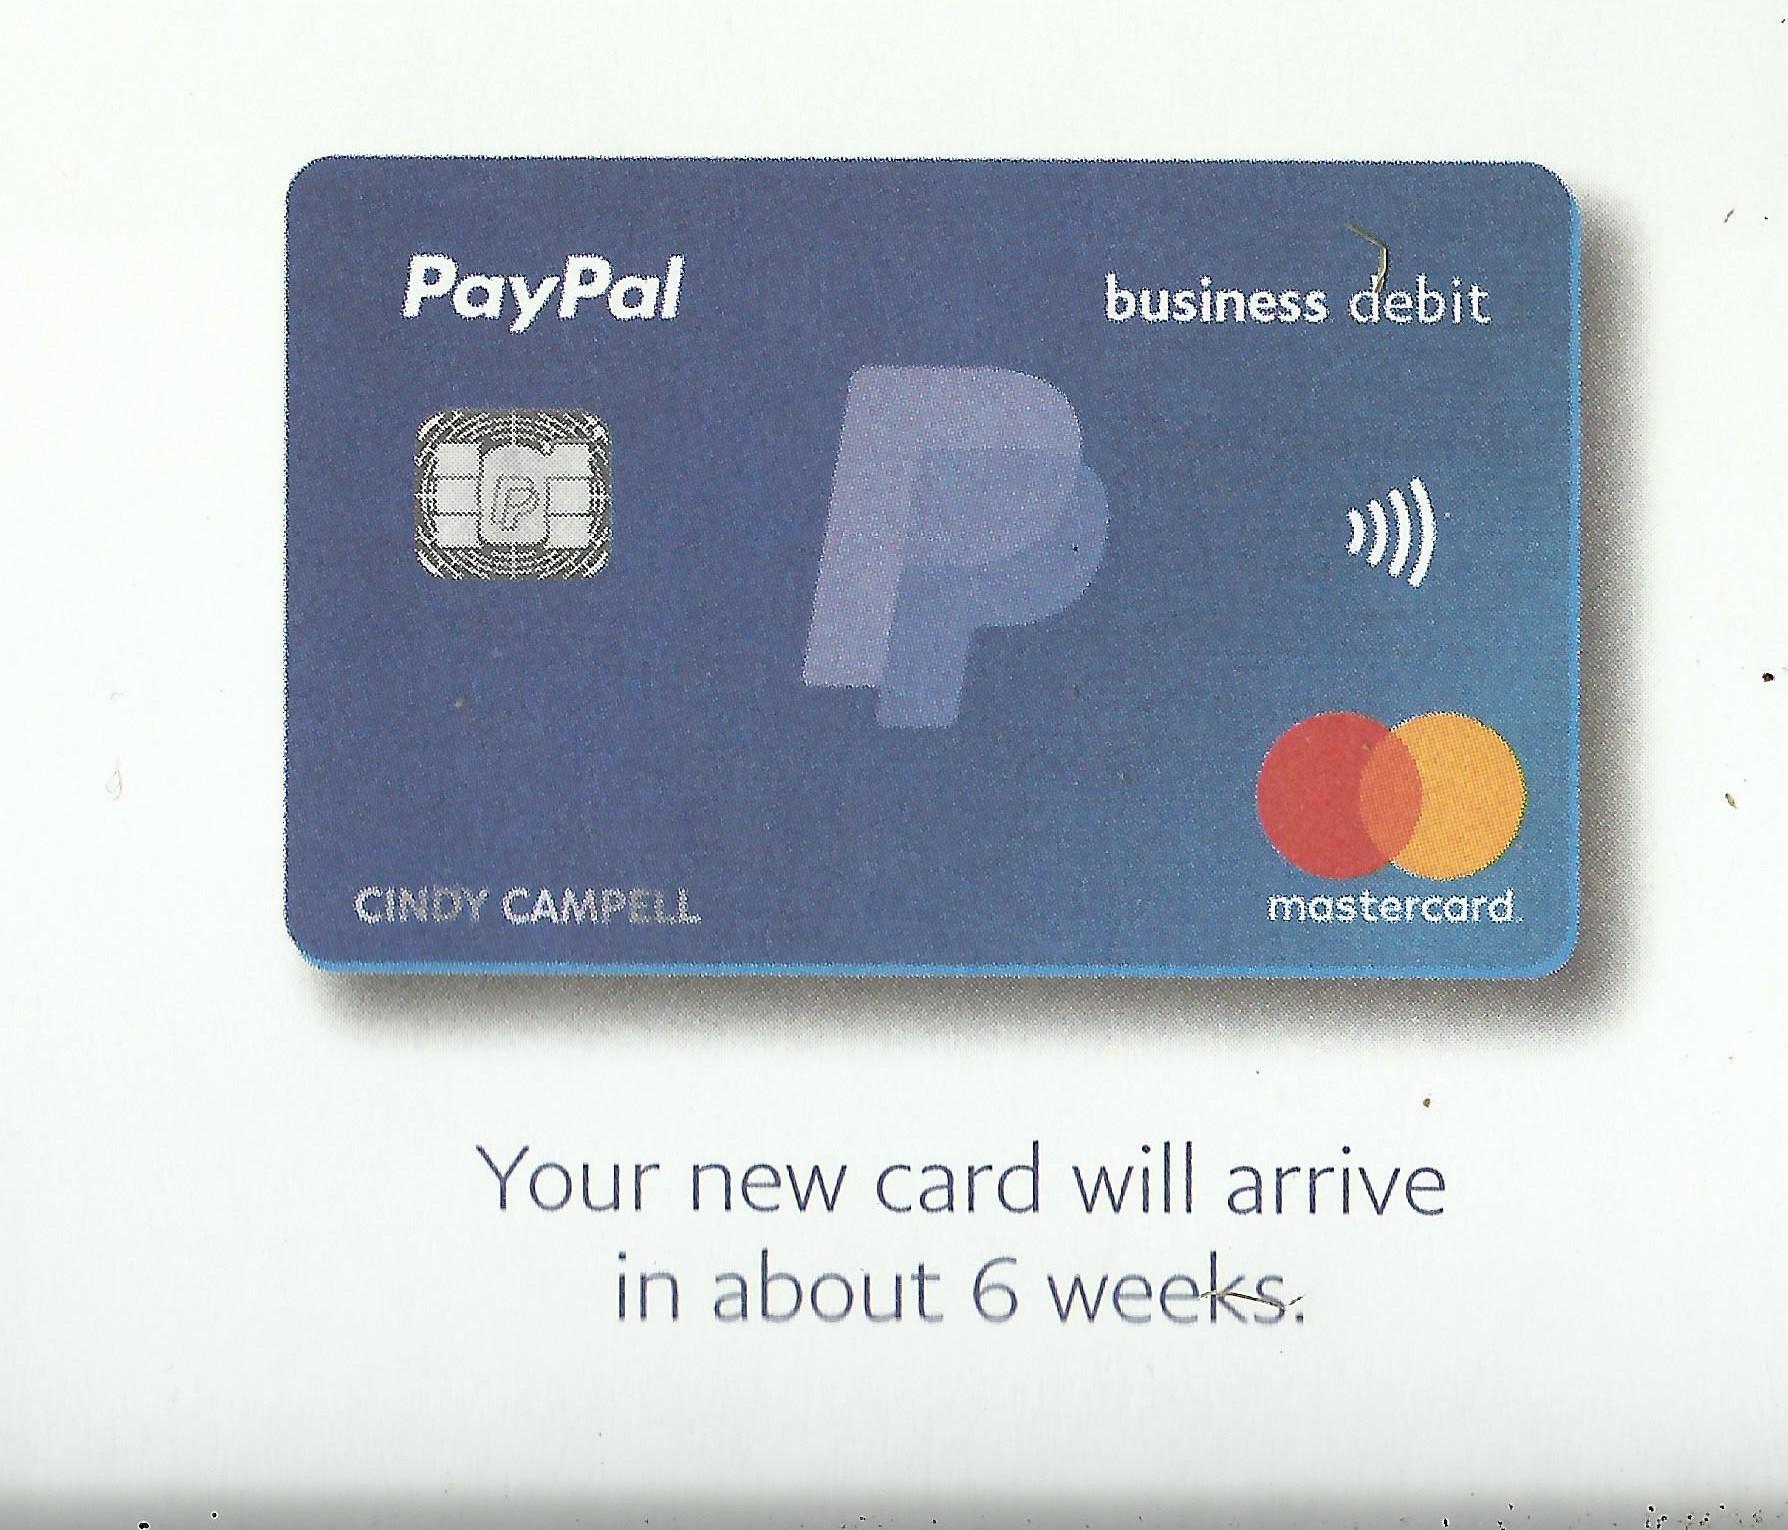 PayPal Business Debit Mastercard / myLot